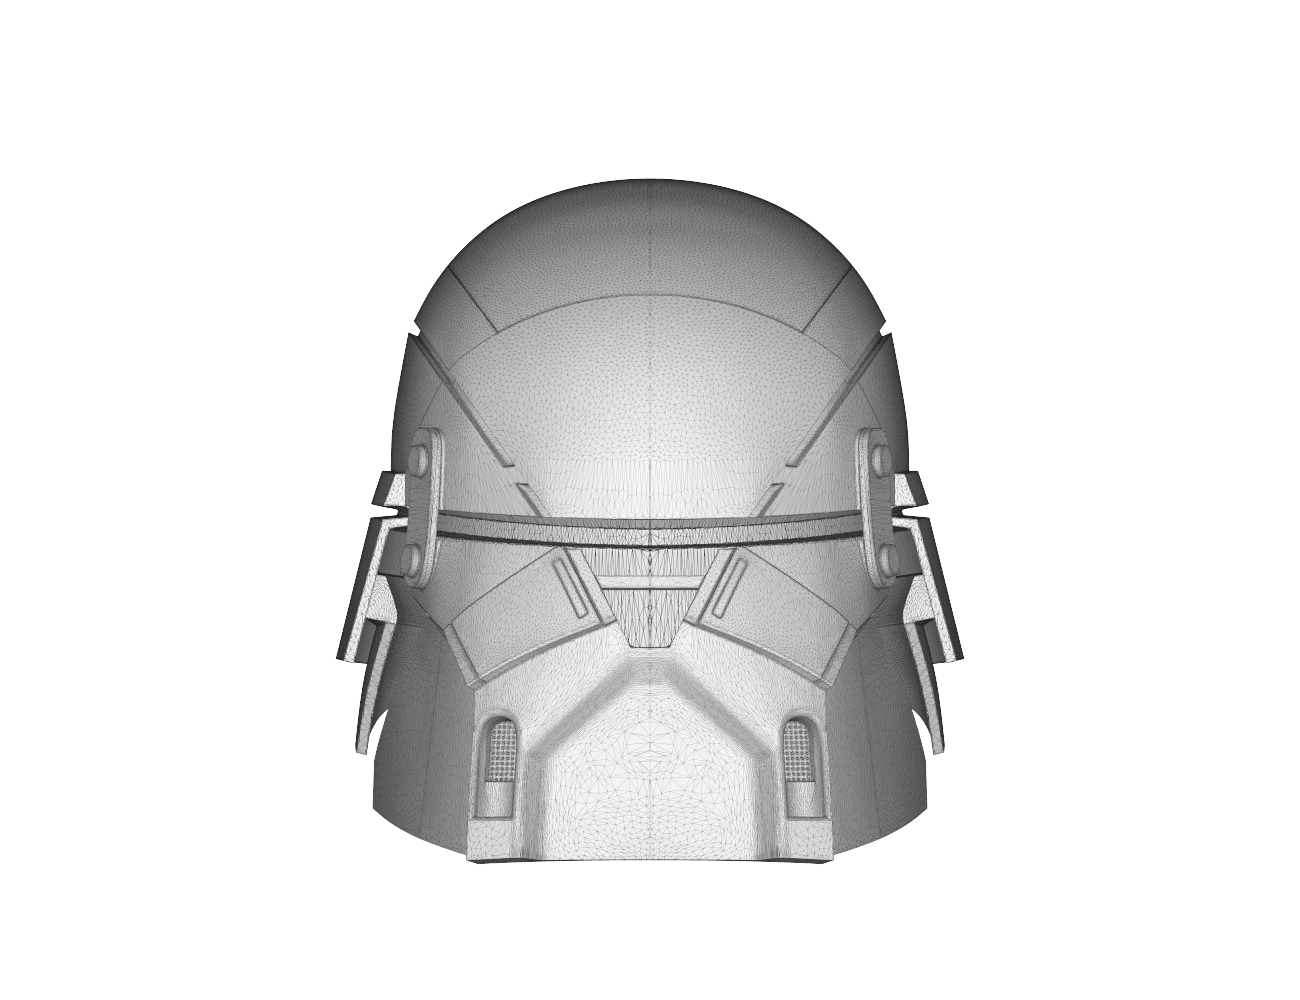 render_scene-front.12.png Download STL file Armory - Knights of Ren Helmet, StarWars model for 3D Print • 3D printing design, 3D-mon